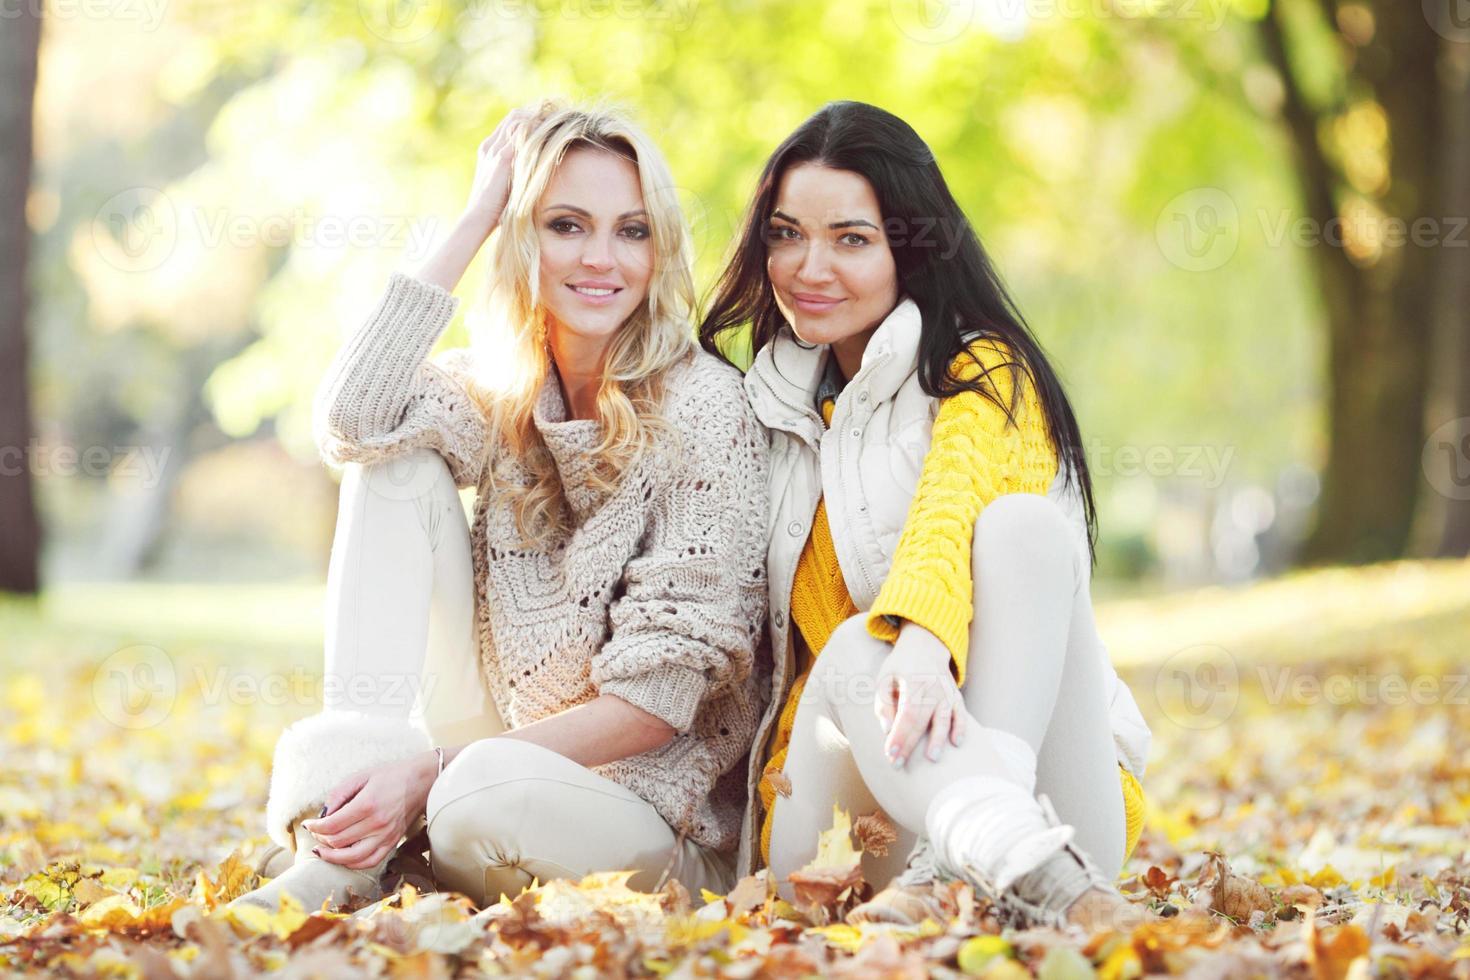 Friends in autumn park photo